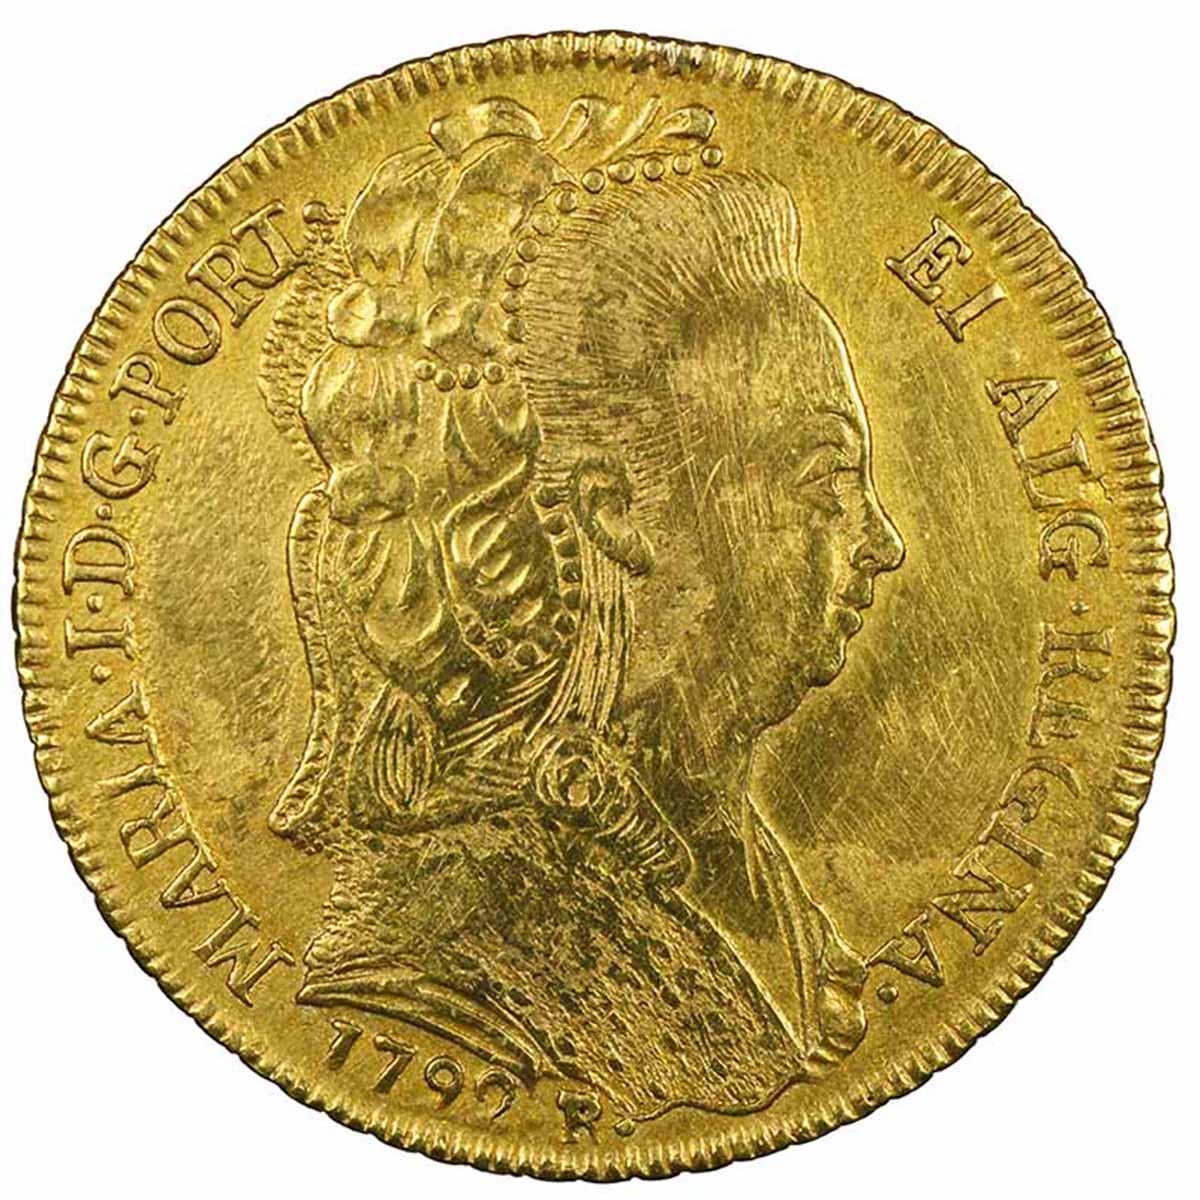 Moneta in oro del Brasile 6400 Reis o peca della Regina Maria